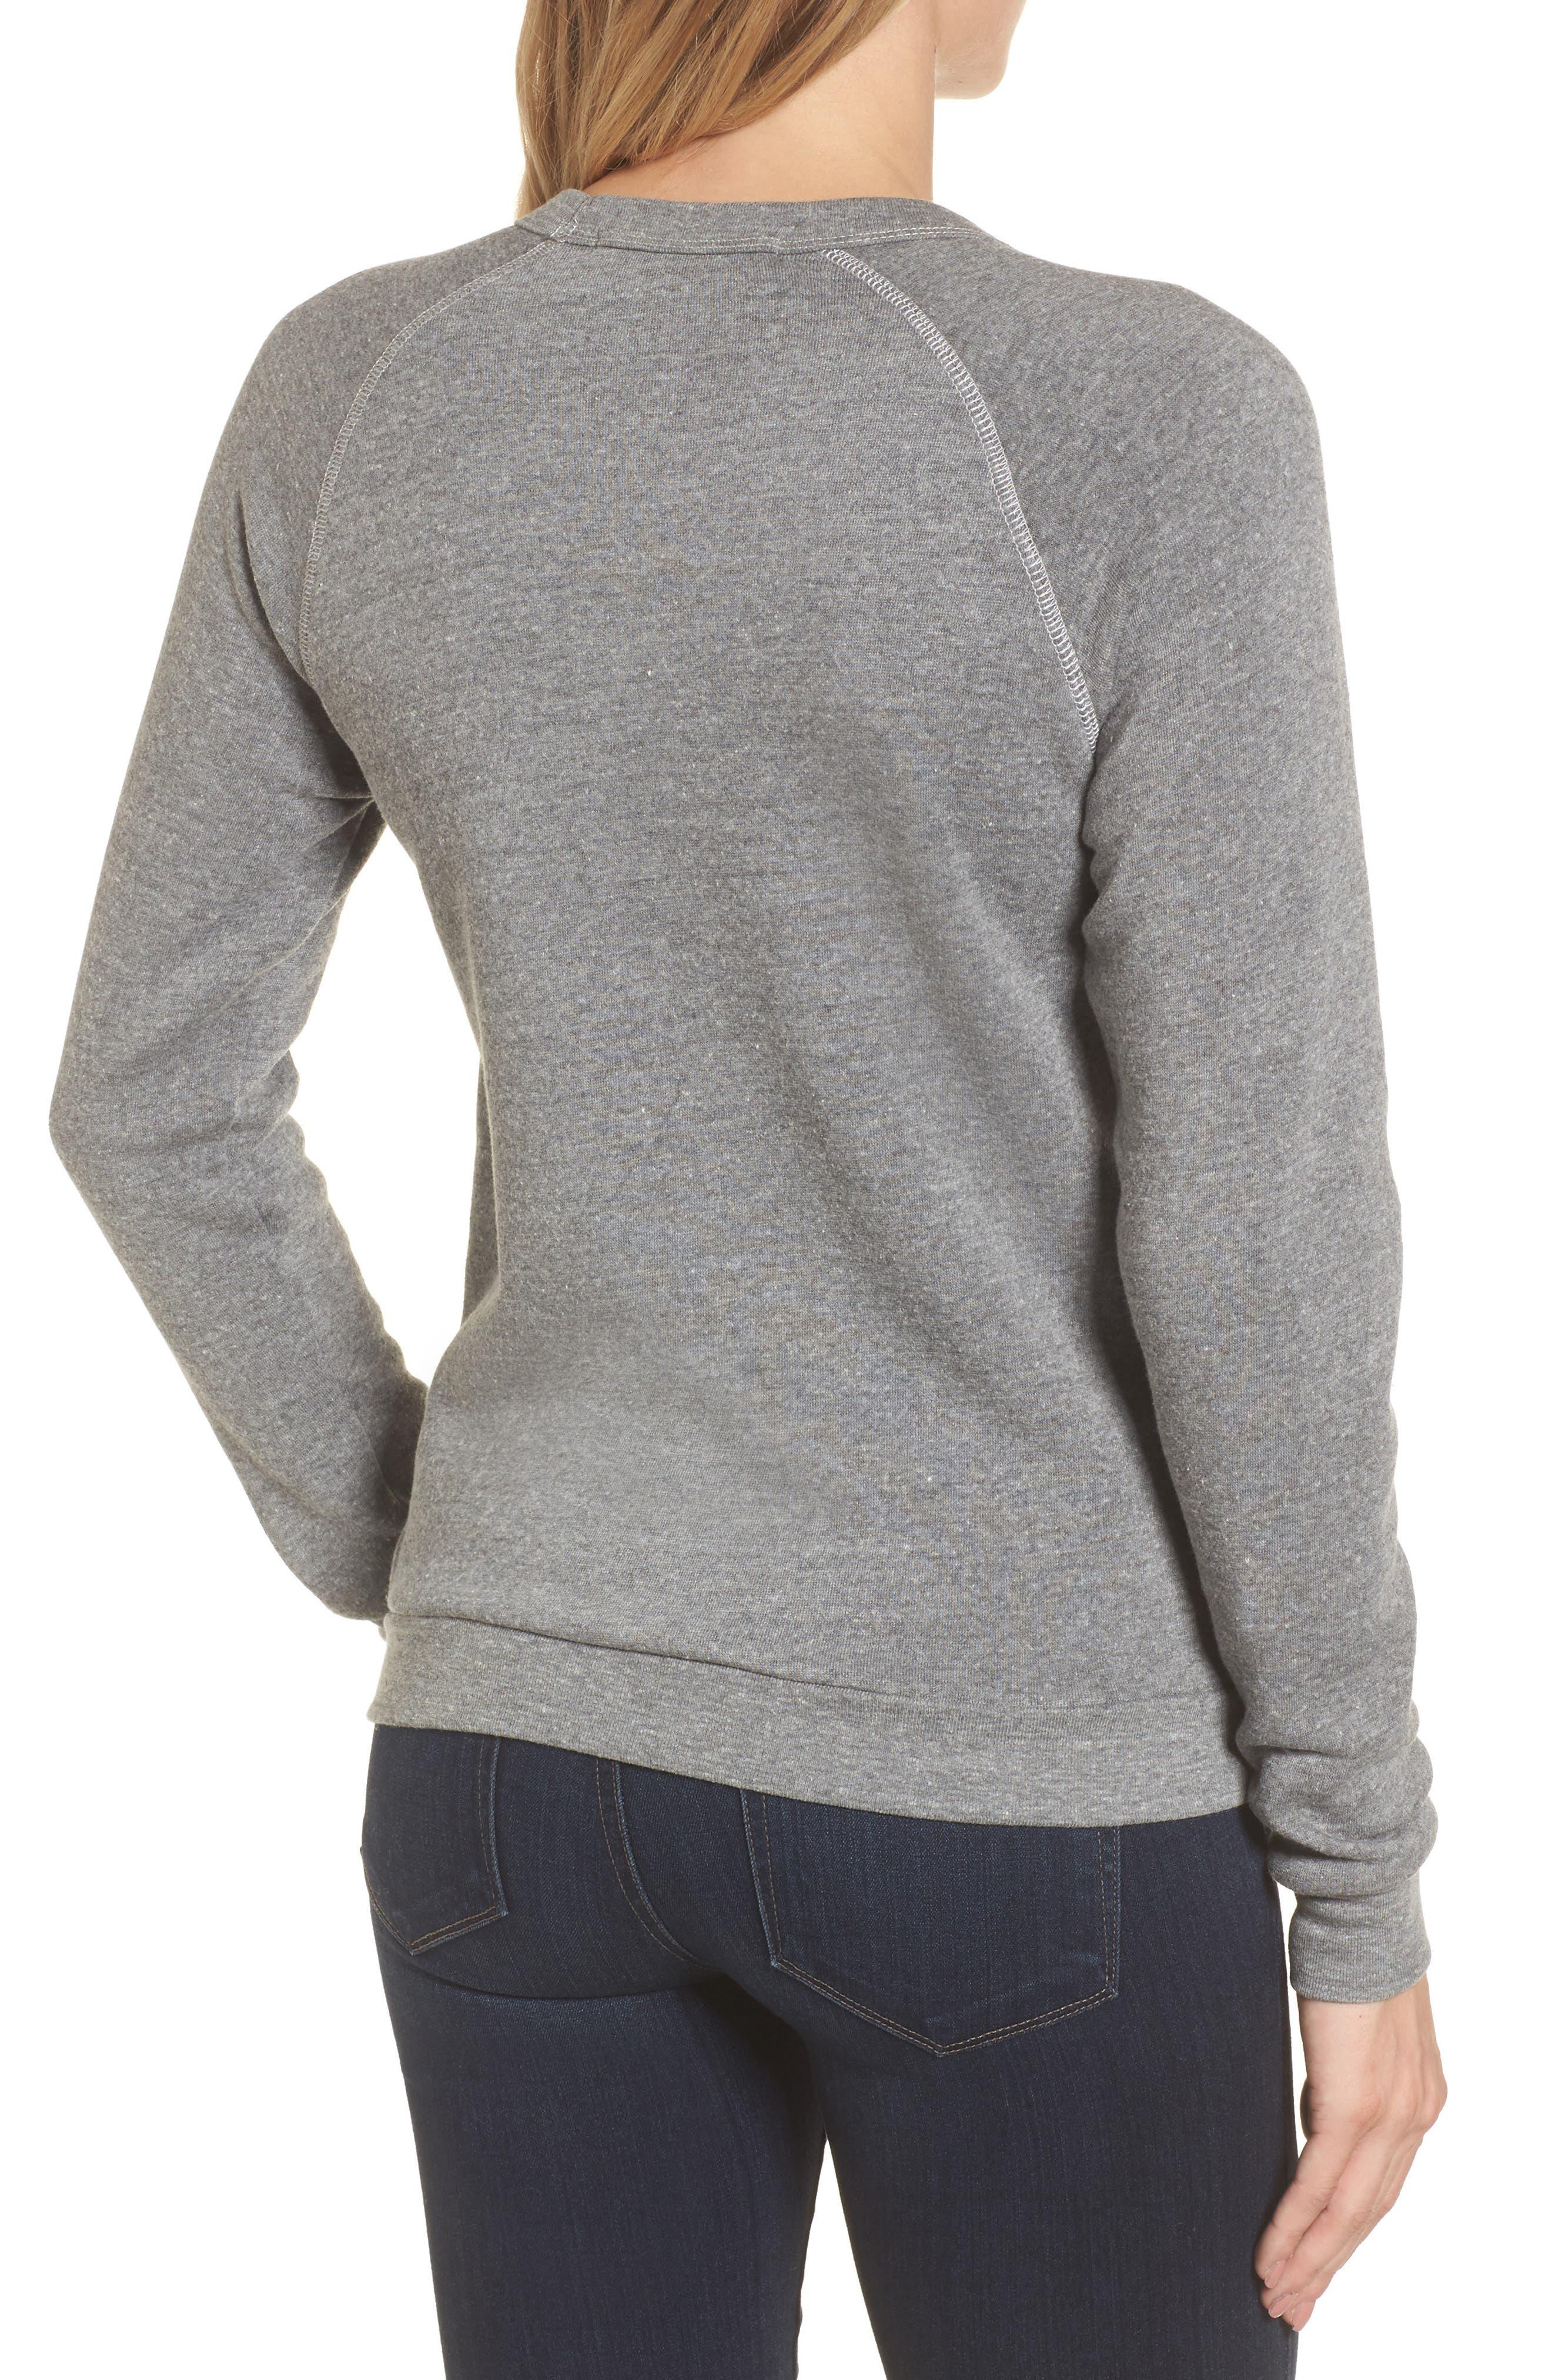 Alternate Image 2  - Bow & Drape Sweet Dreams are Made of Cheese Sweatshirt